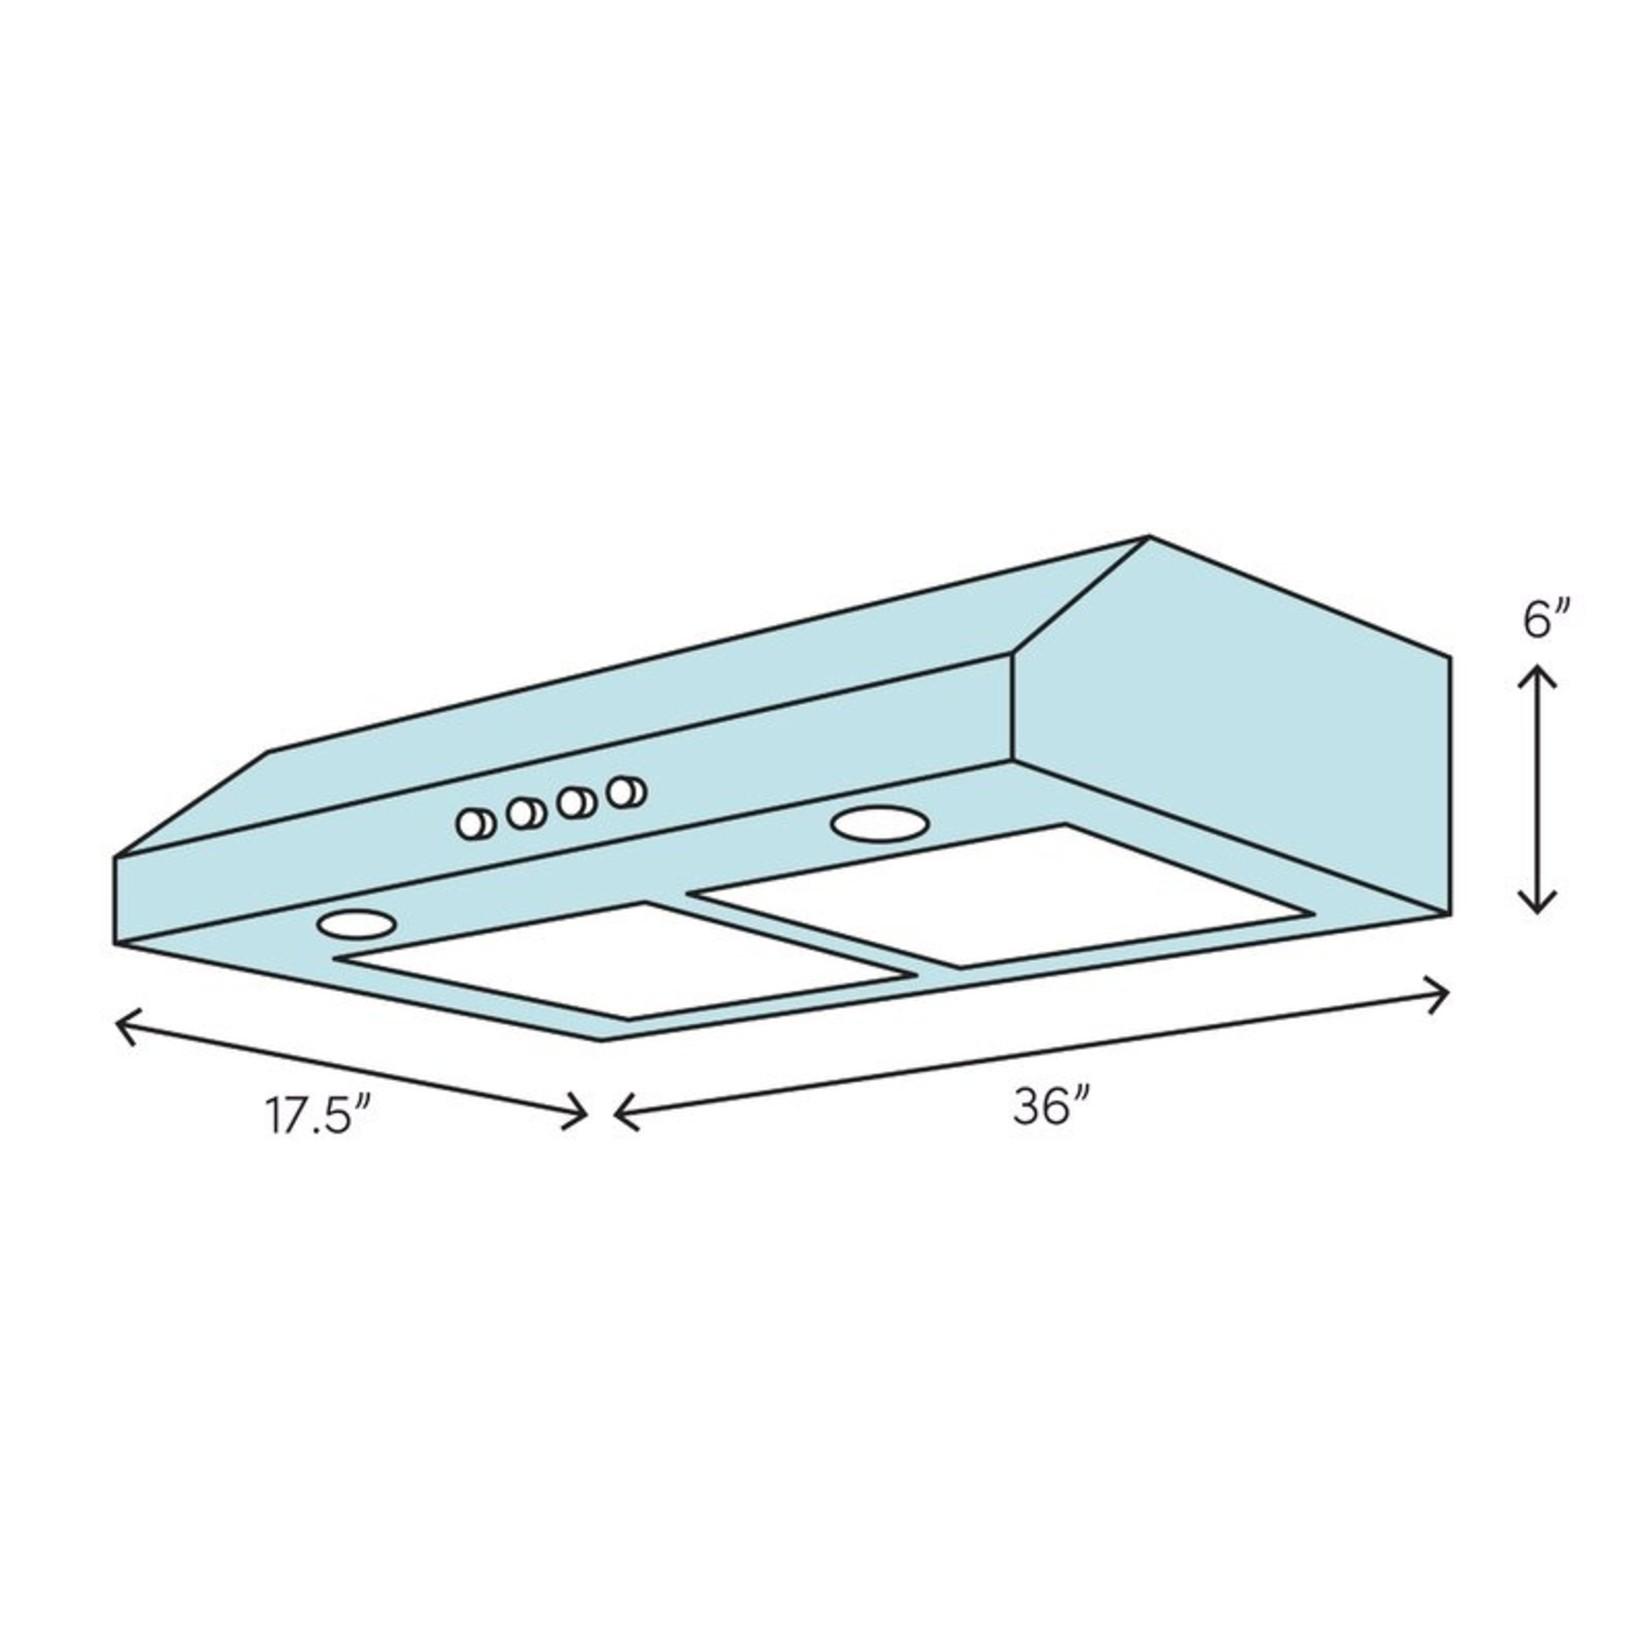 "*36"" 40000 Series 160 CFM Ducted Under Cabinet Range Hood"